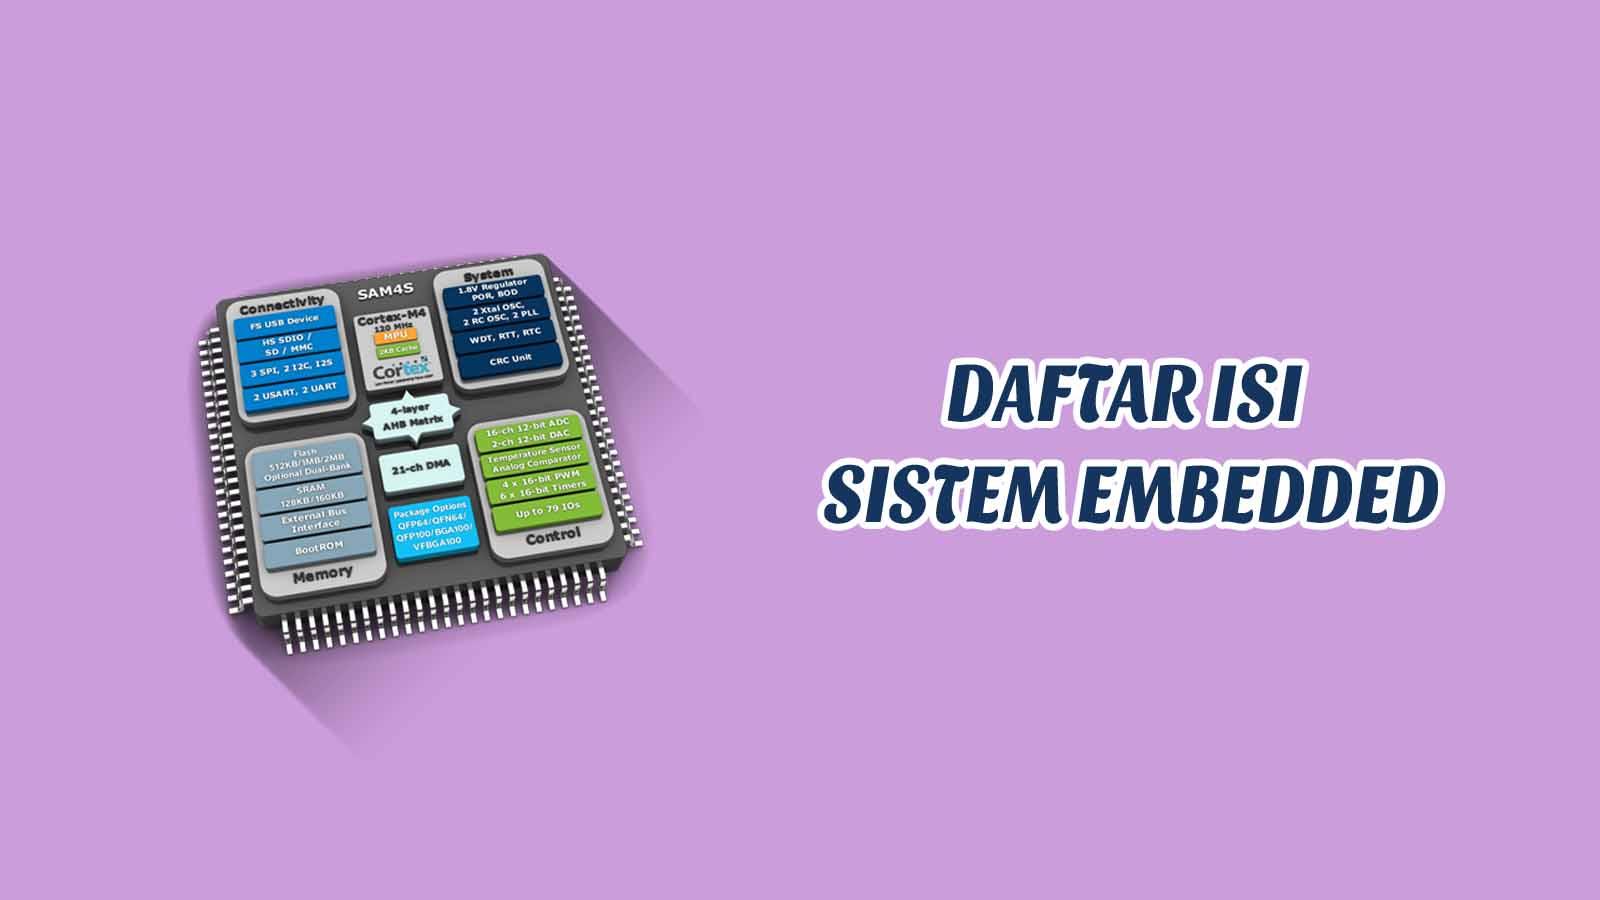 Daftar Isi - Sistem Embedded